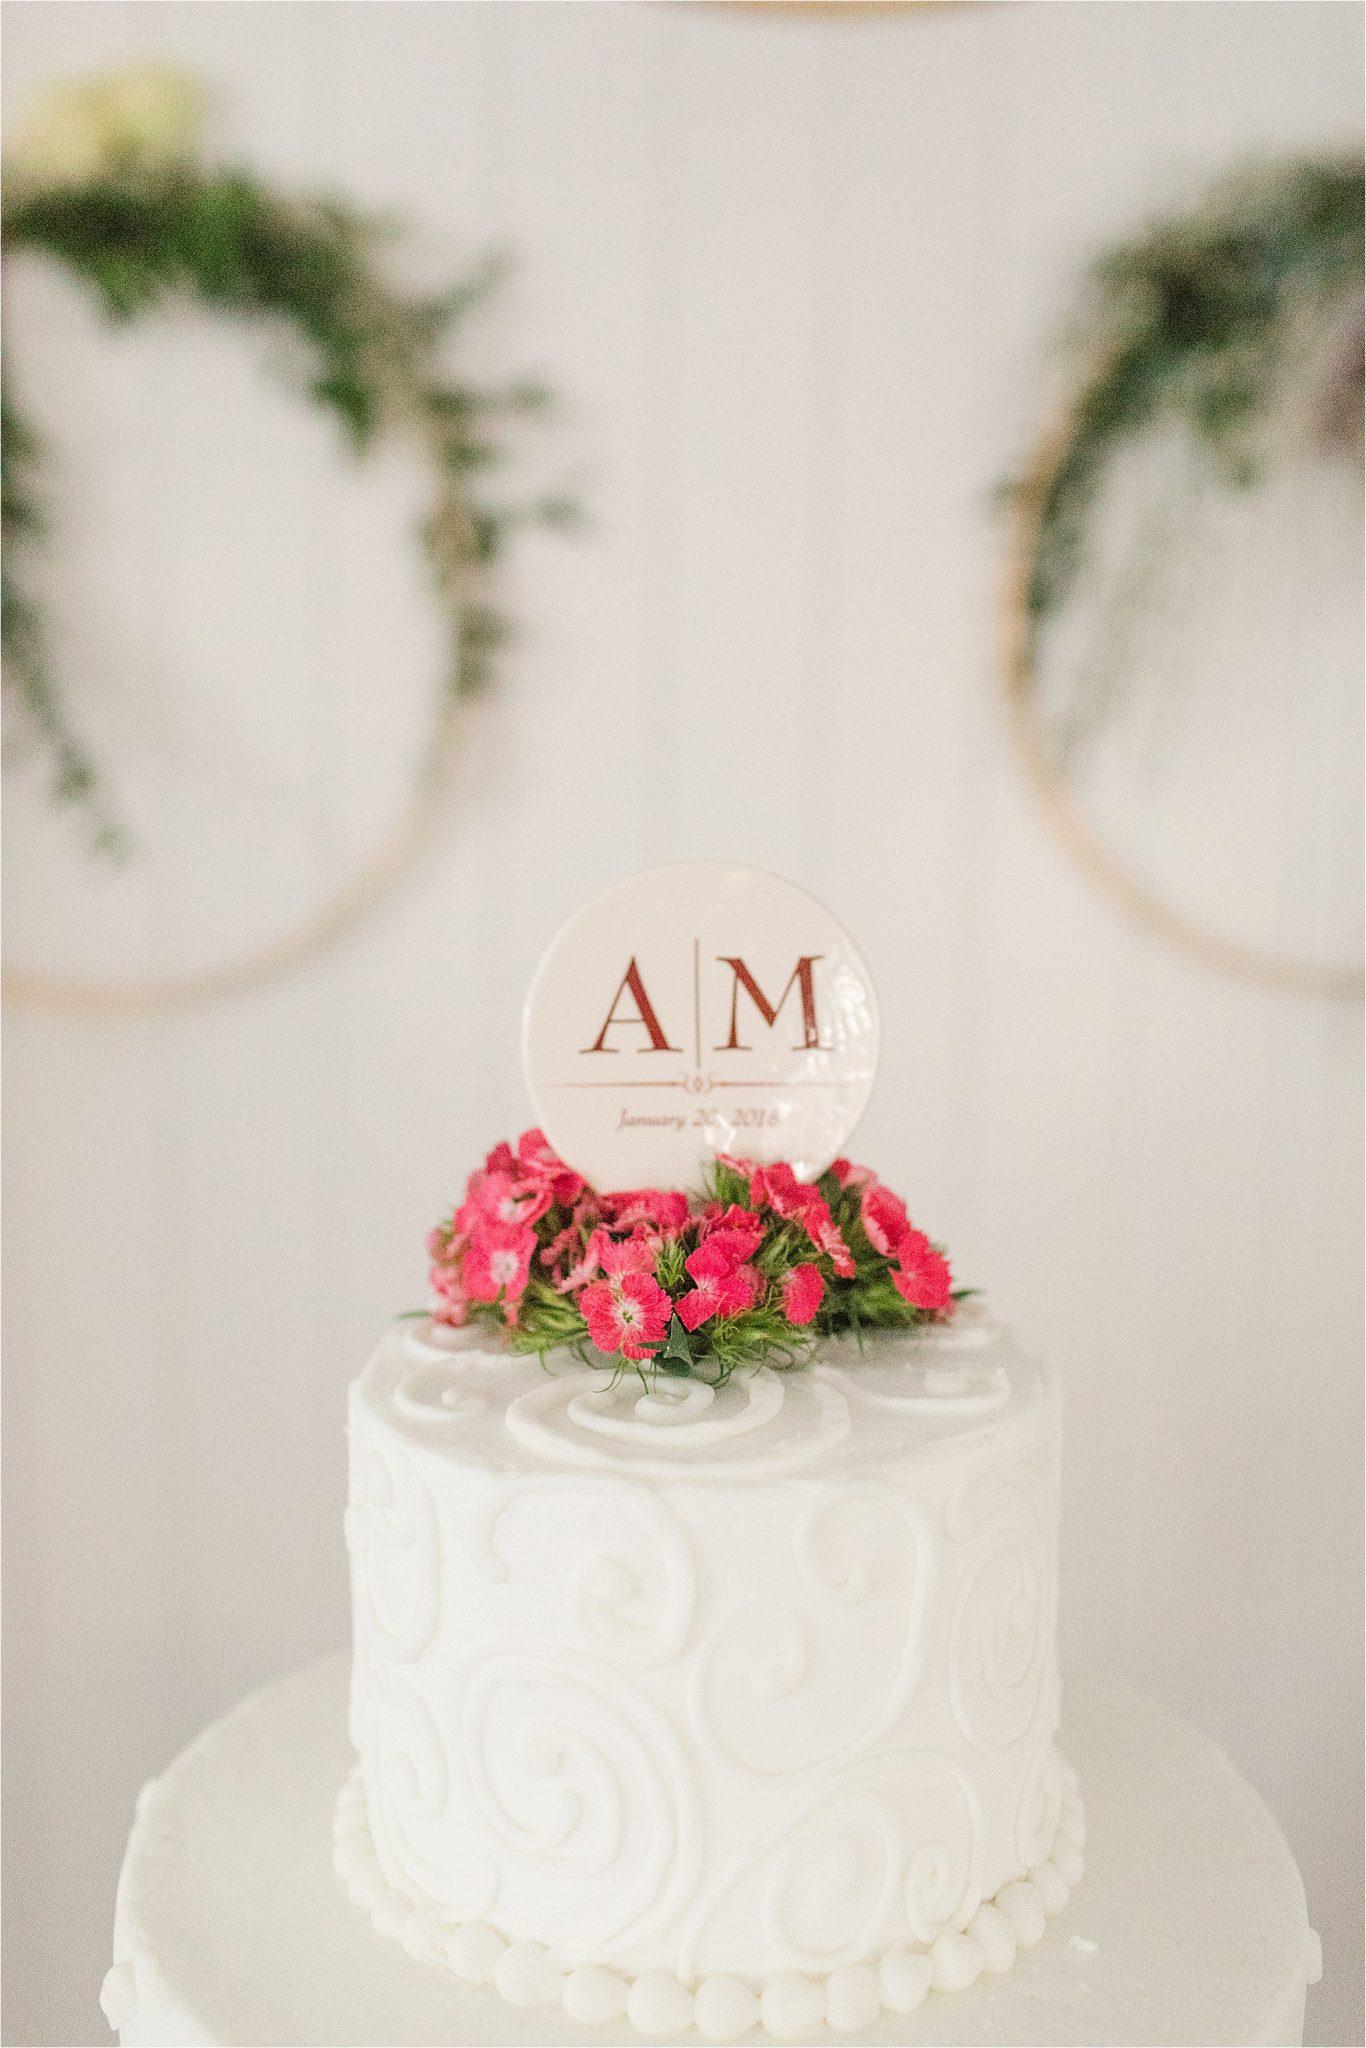 Alabama Wedding Photographer-Little Point Clear Winter Wedding-Meri Beth + Andrew-Wedding cake-Wedding details